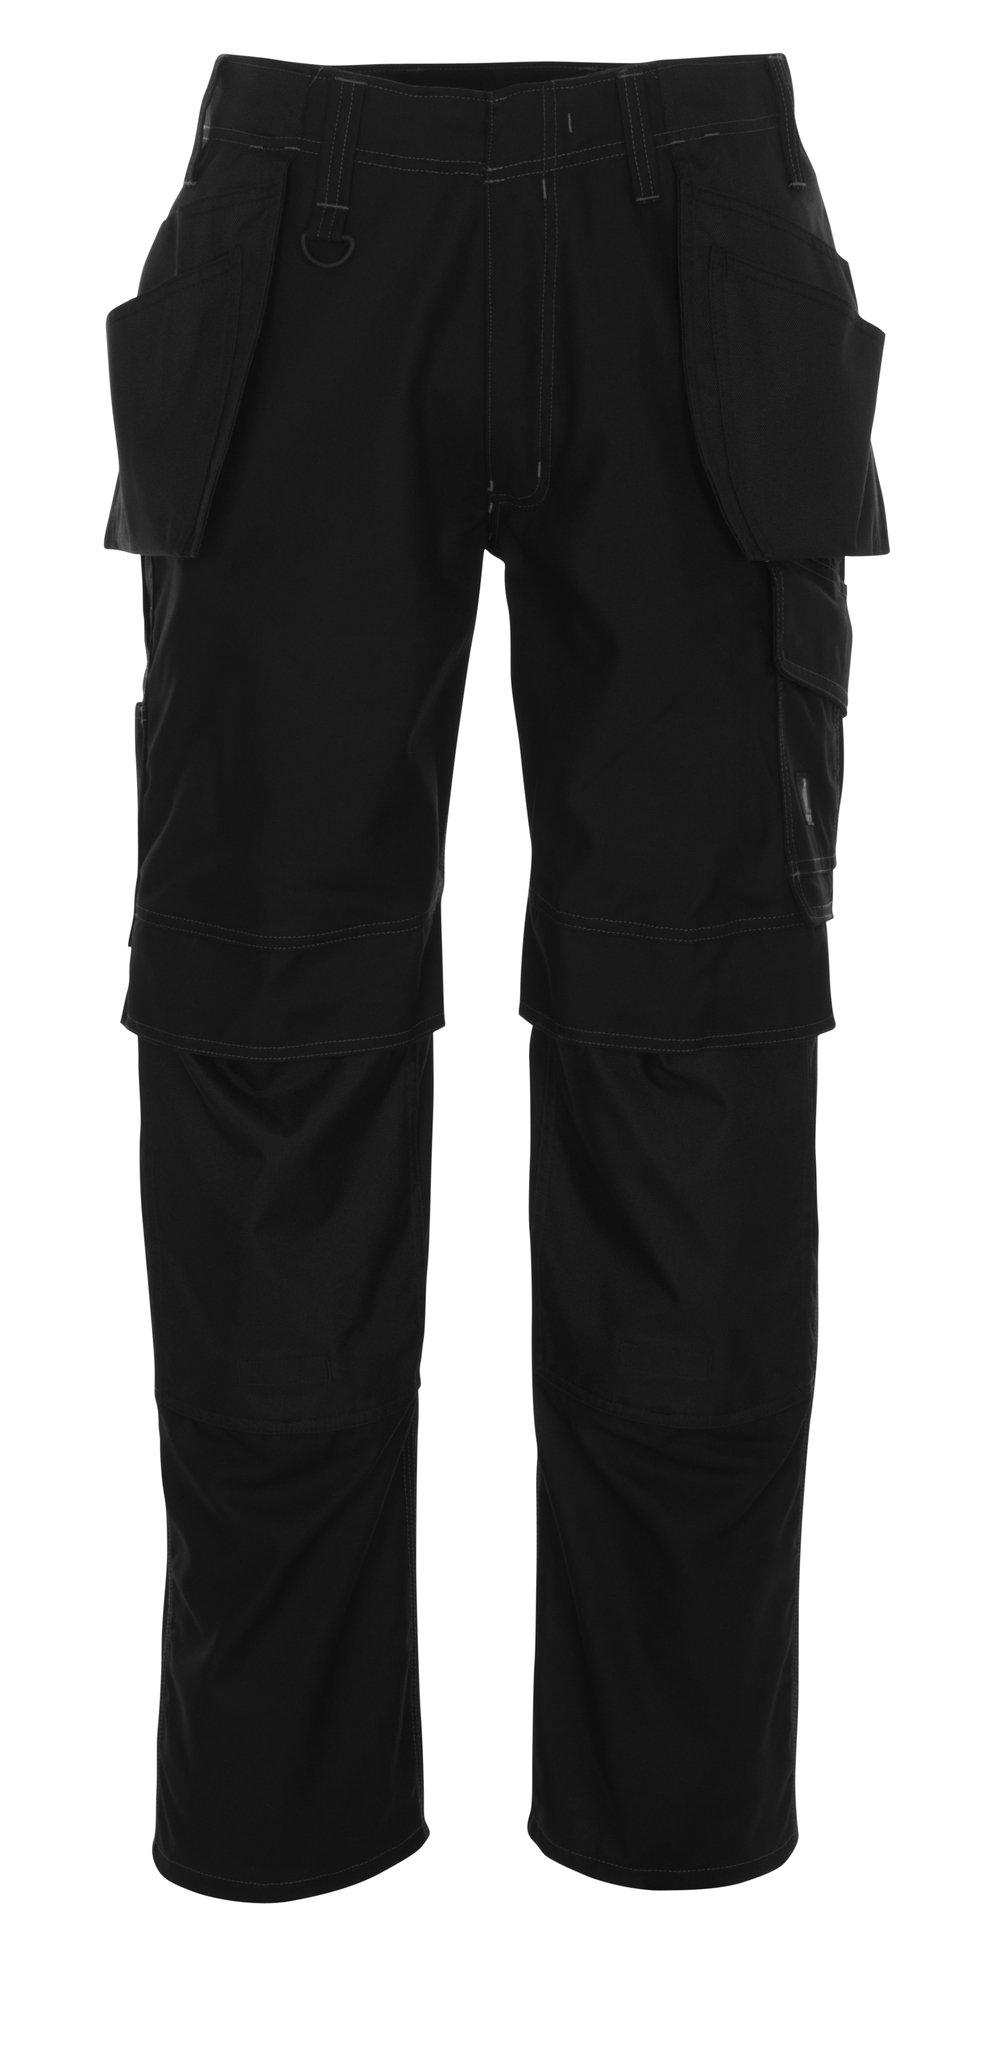 Mascot 10131-154-09-90C52''Springfield'' Craftsmen's Trousers, L90cm/C52, Black